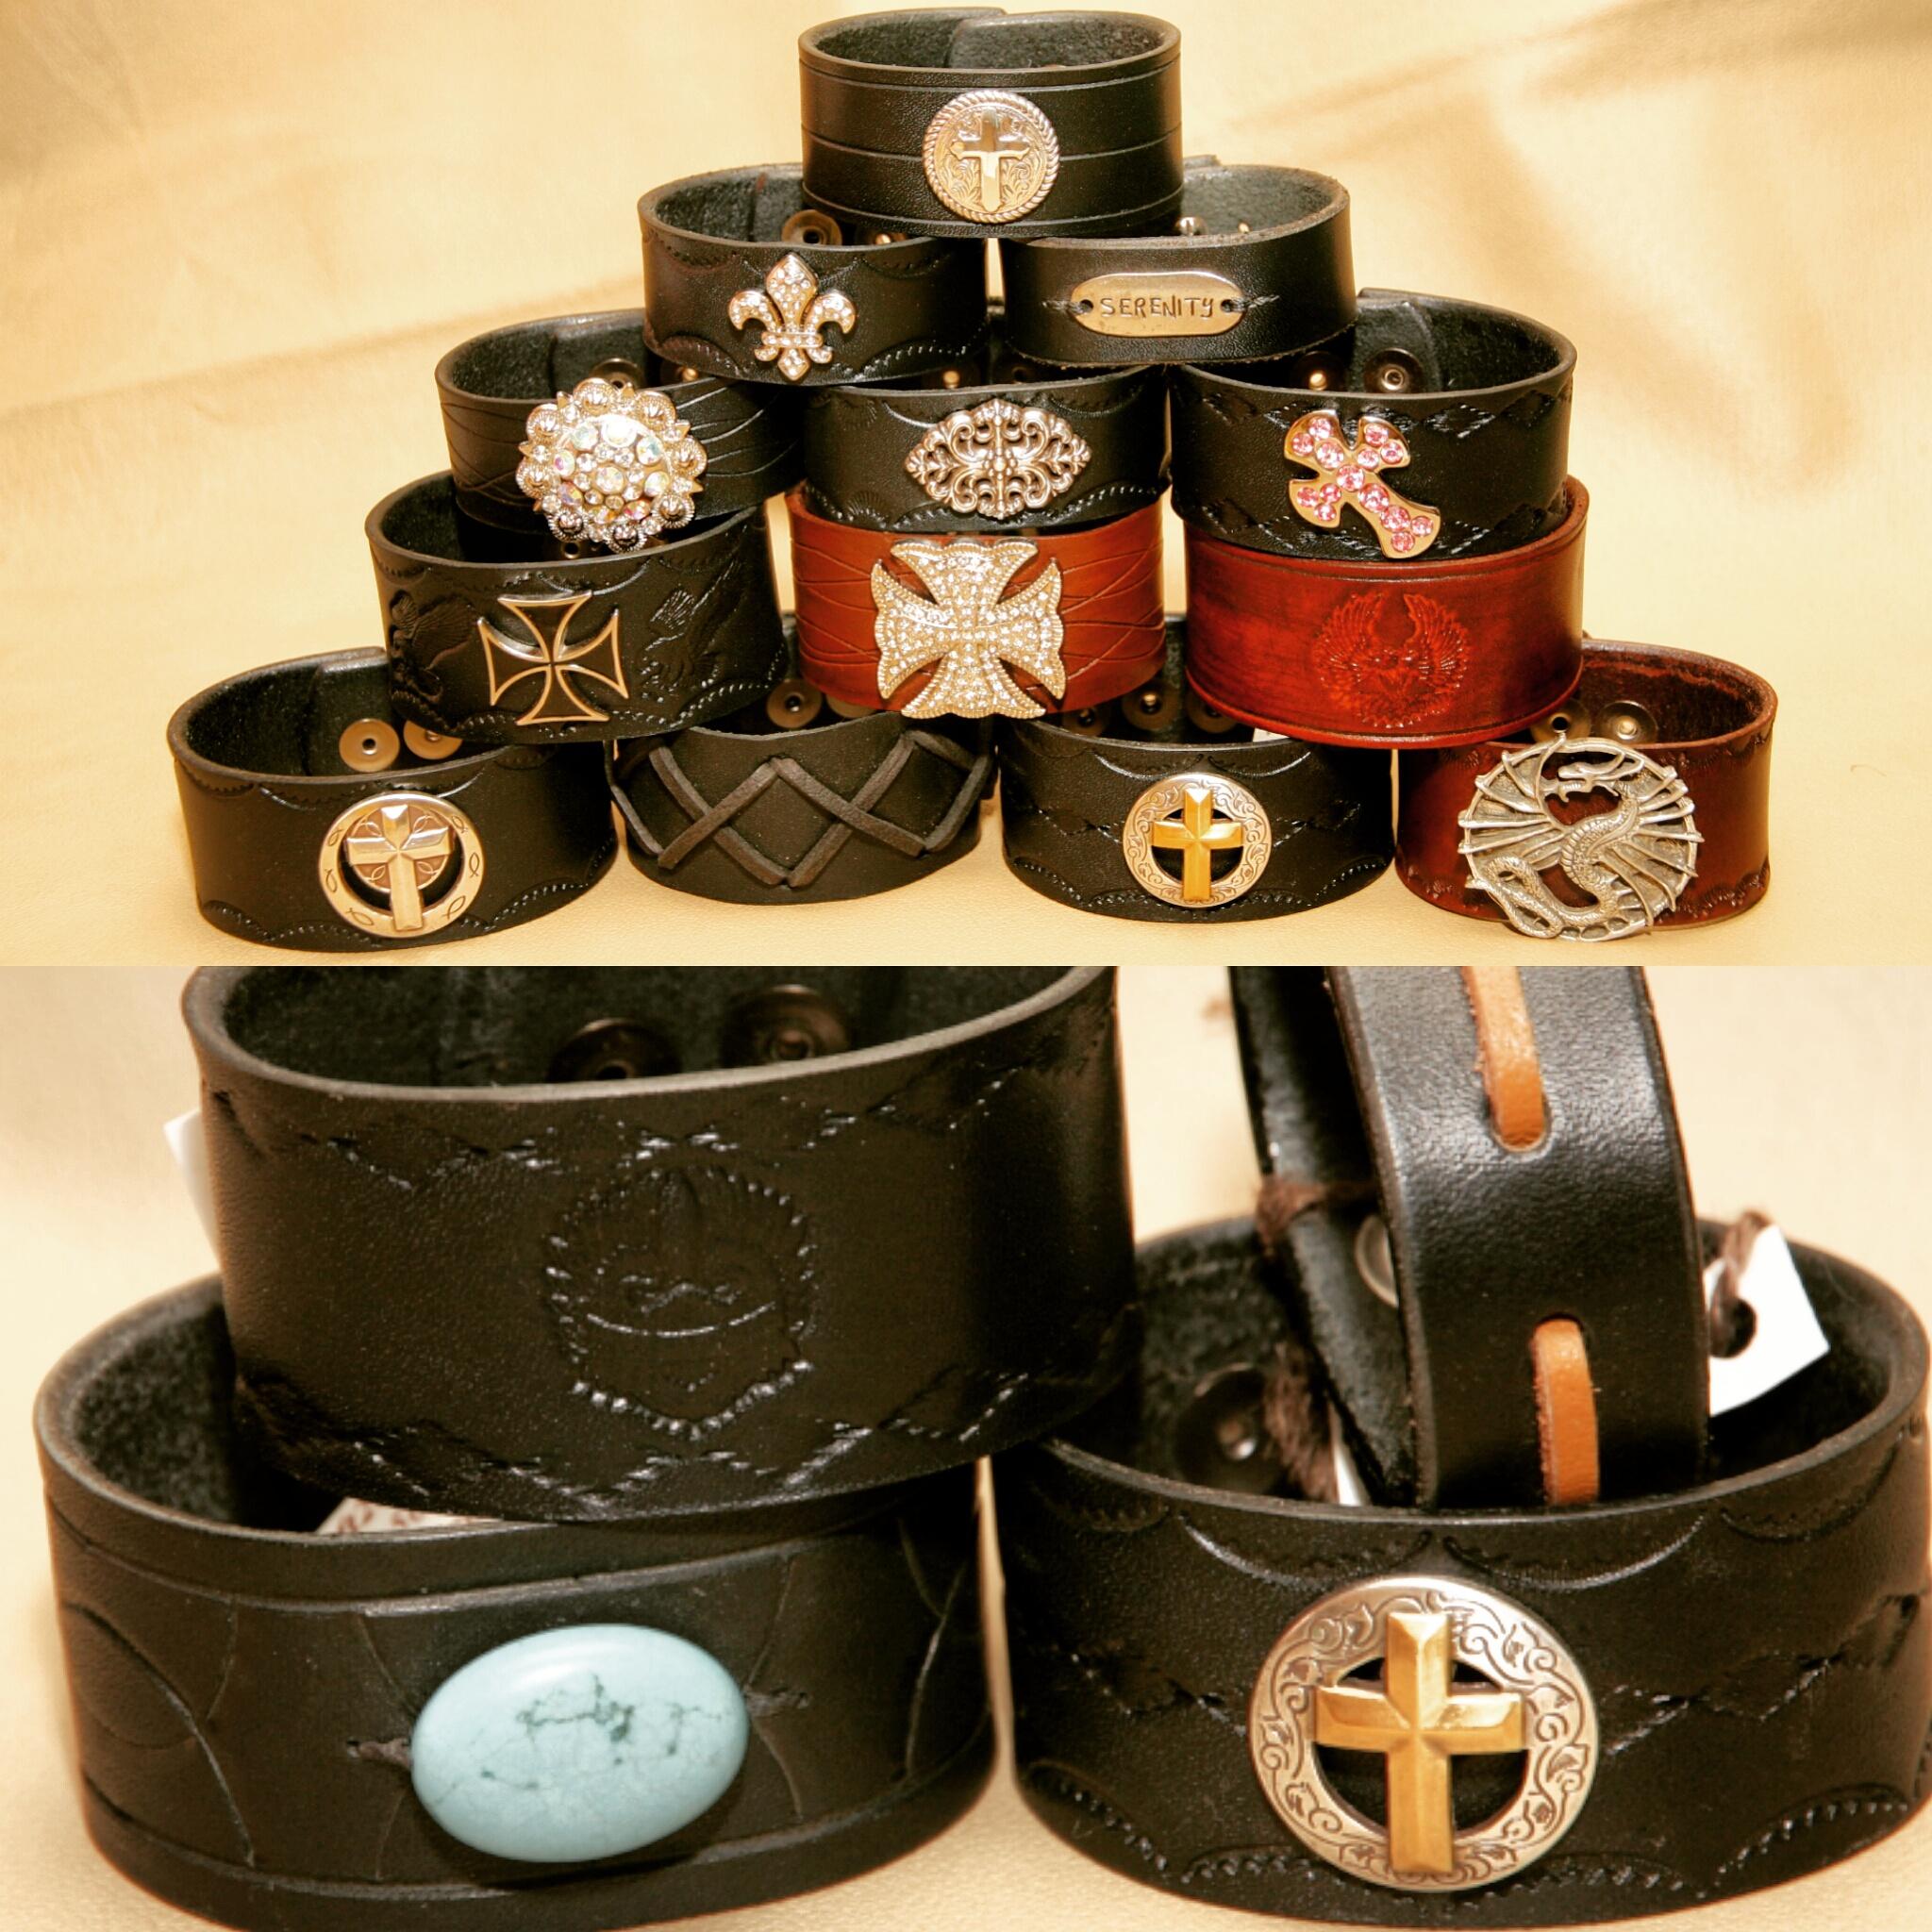 Custom Leather Cuff Bracelets